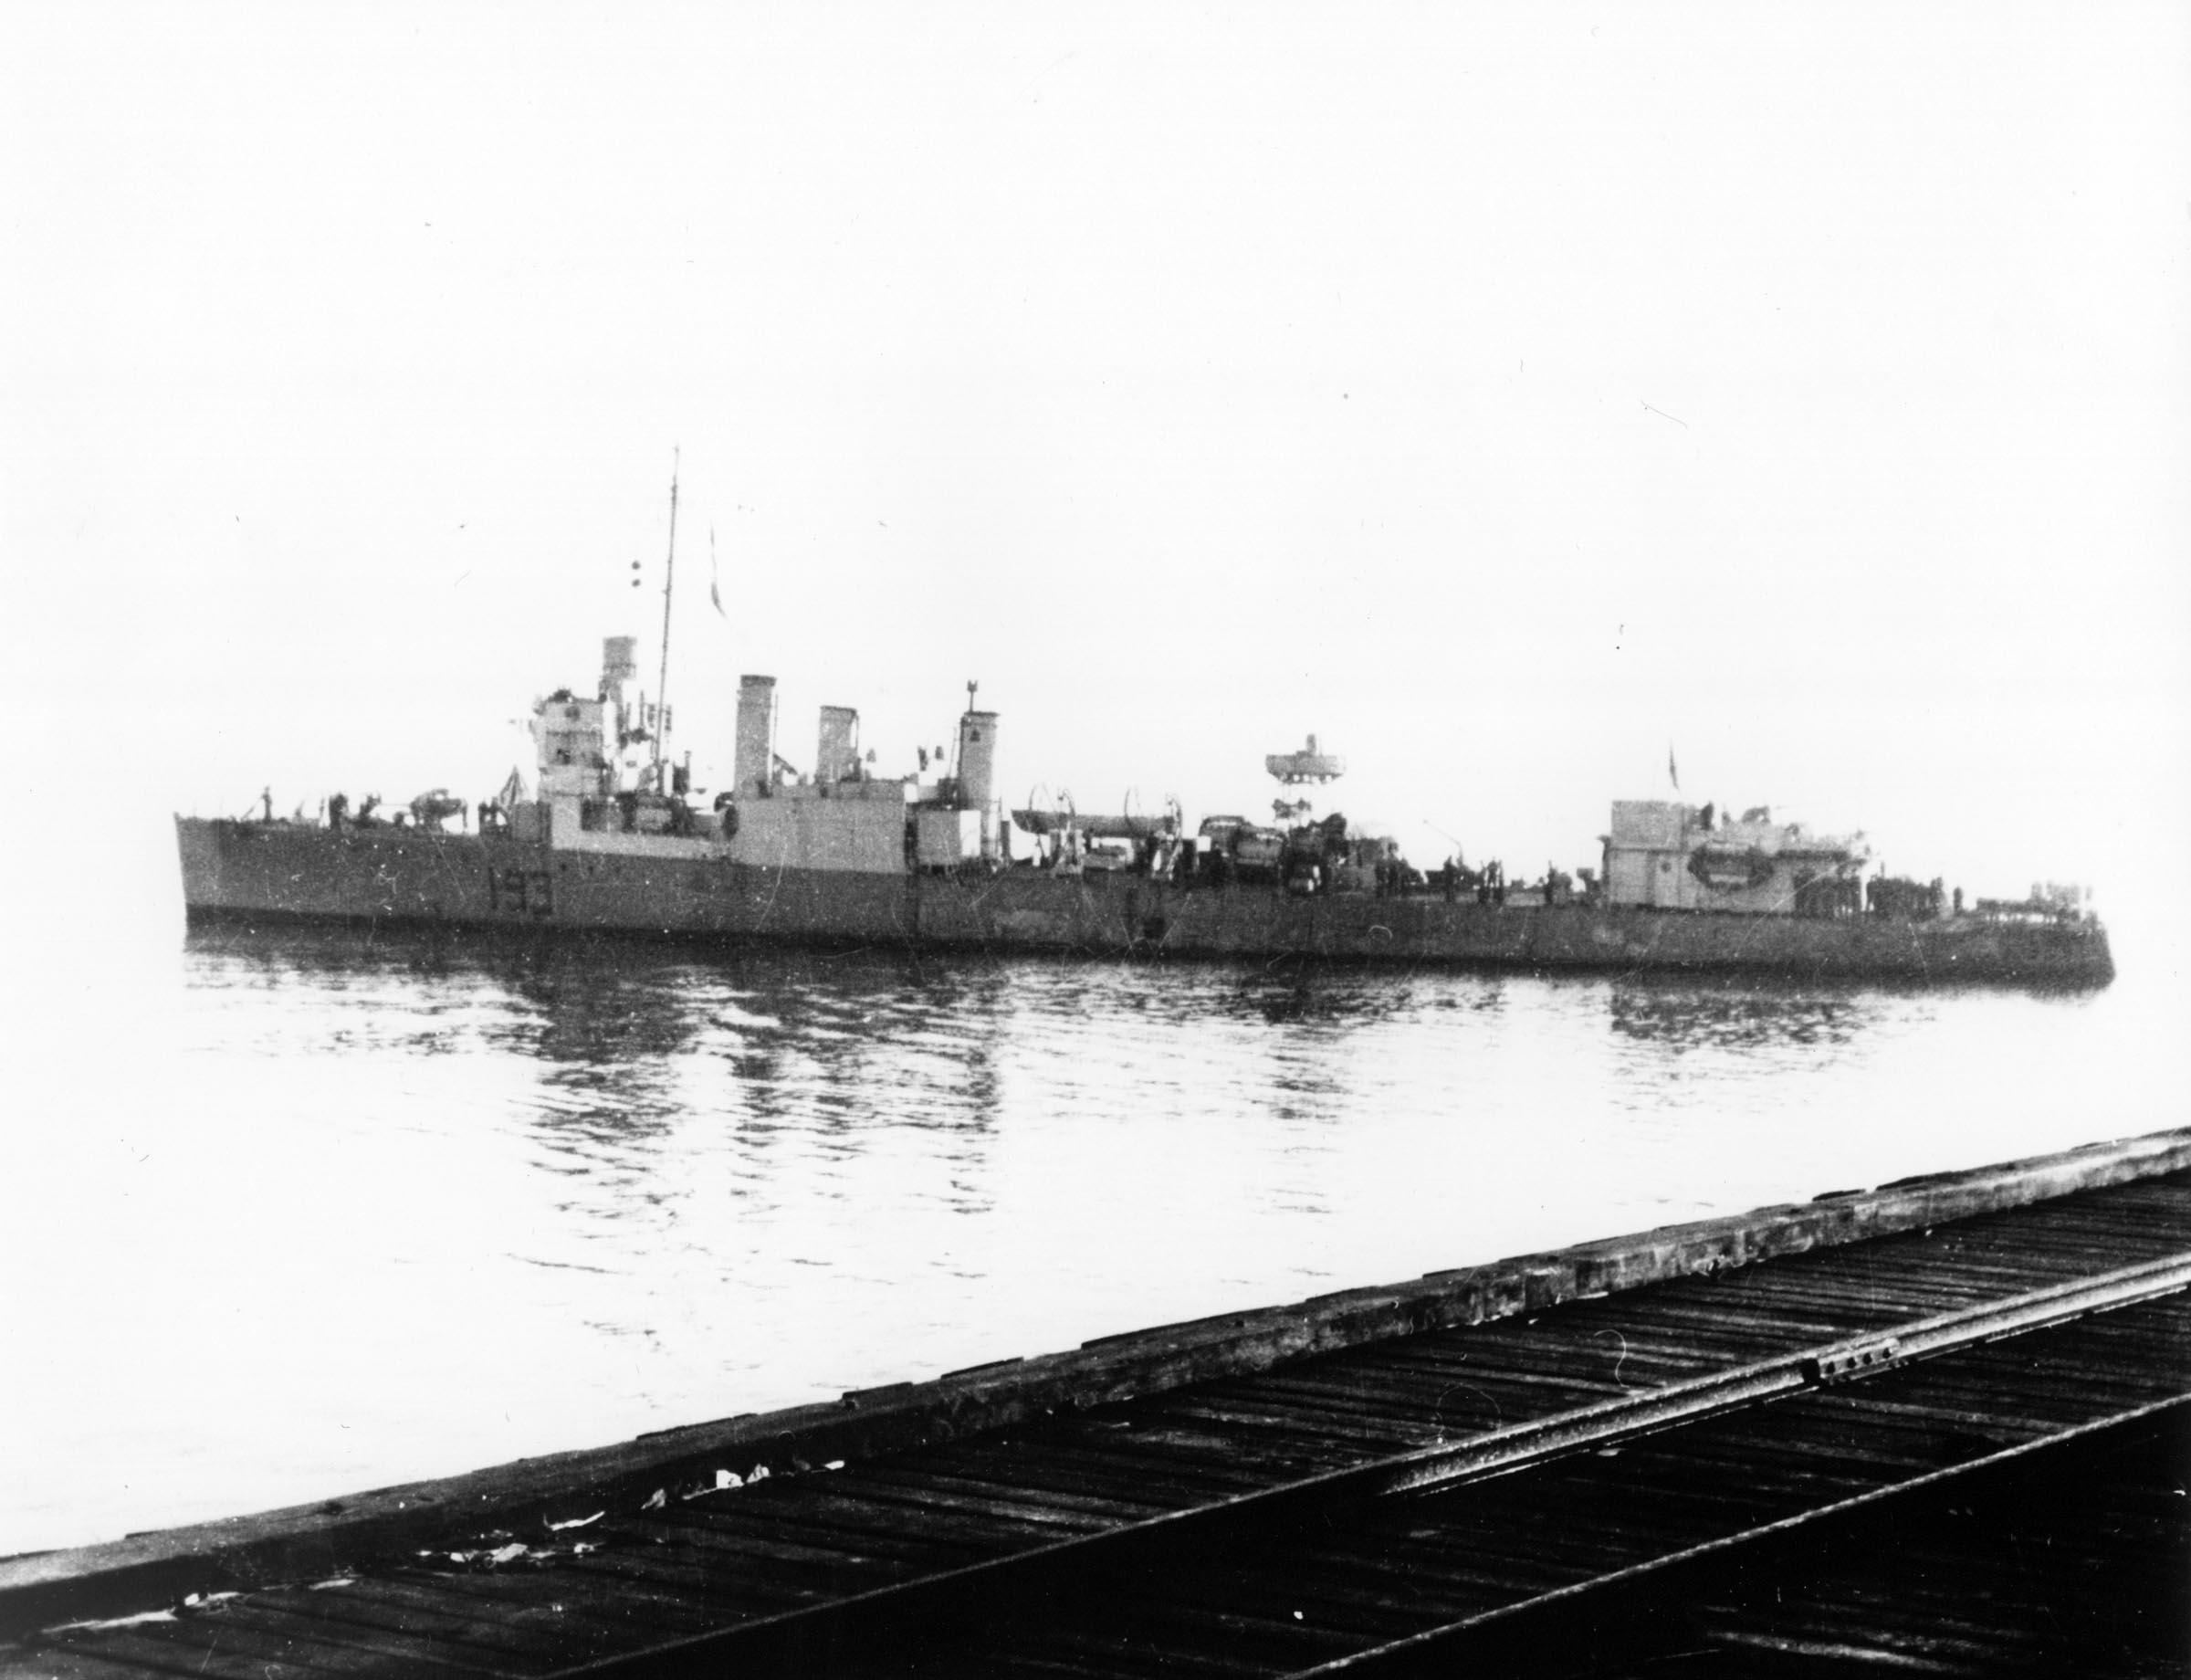 HMCS ST. FRANCIS